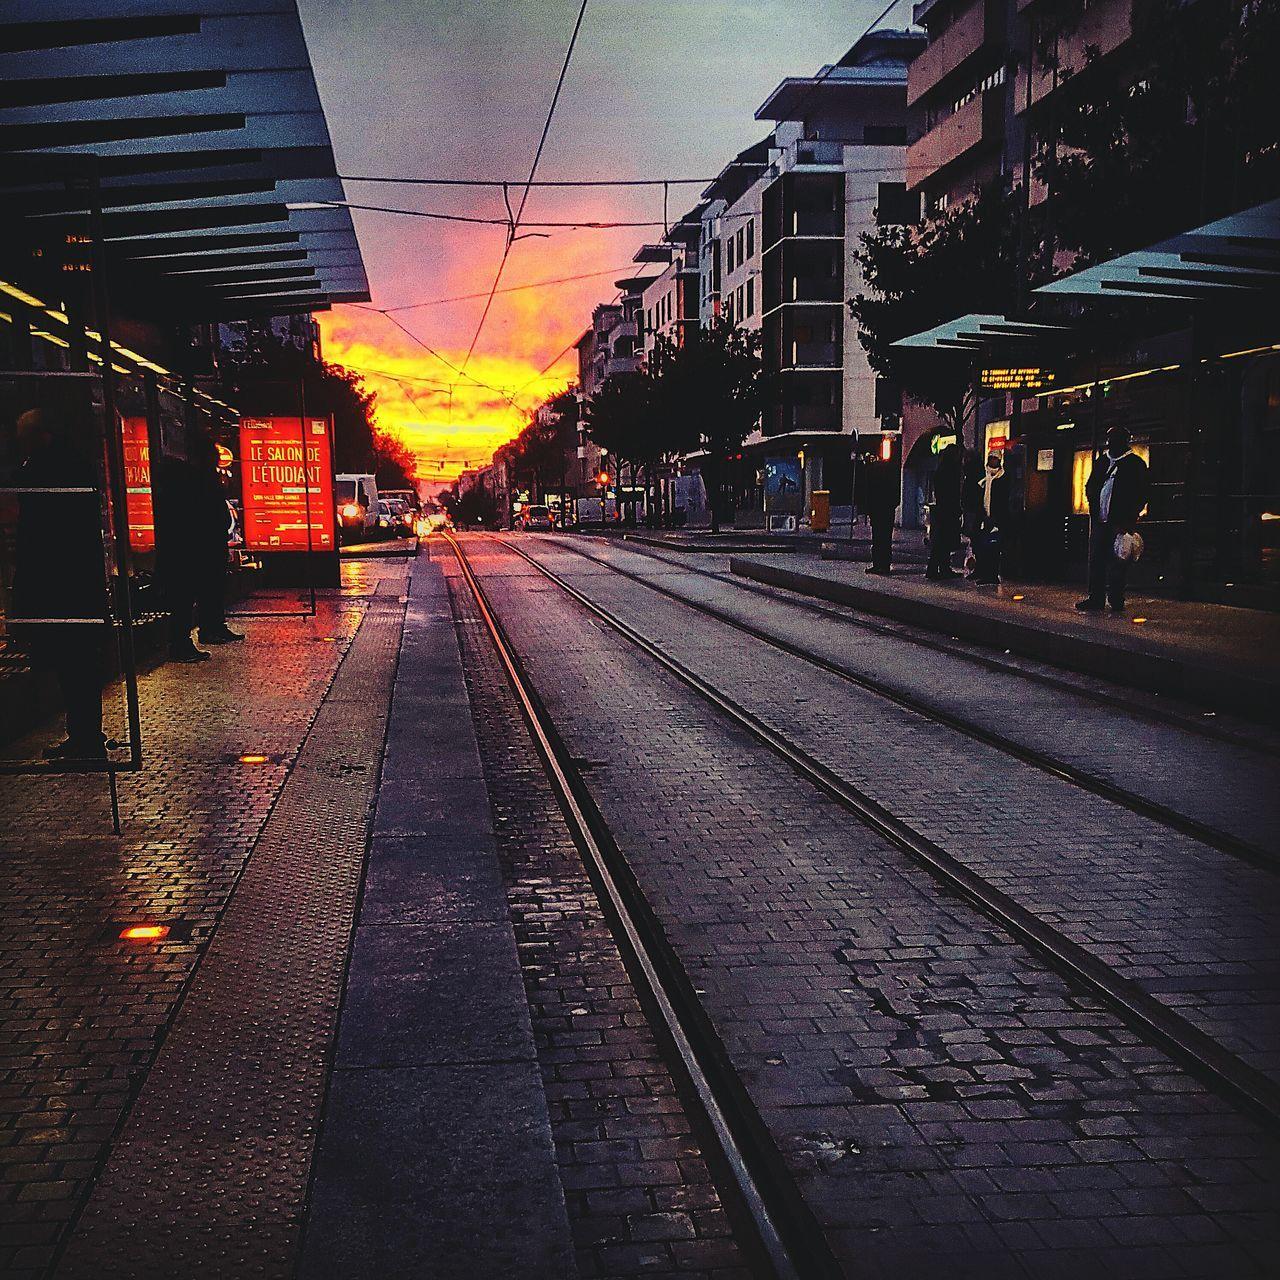 Apocalypse Bron Lyon69 Rhonealpes Mondaymorning France Sunrise Samsung Galaxy S6 Amateurphotographer